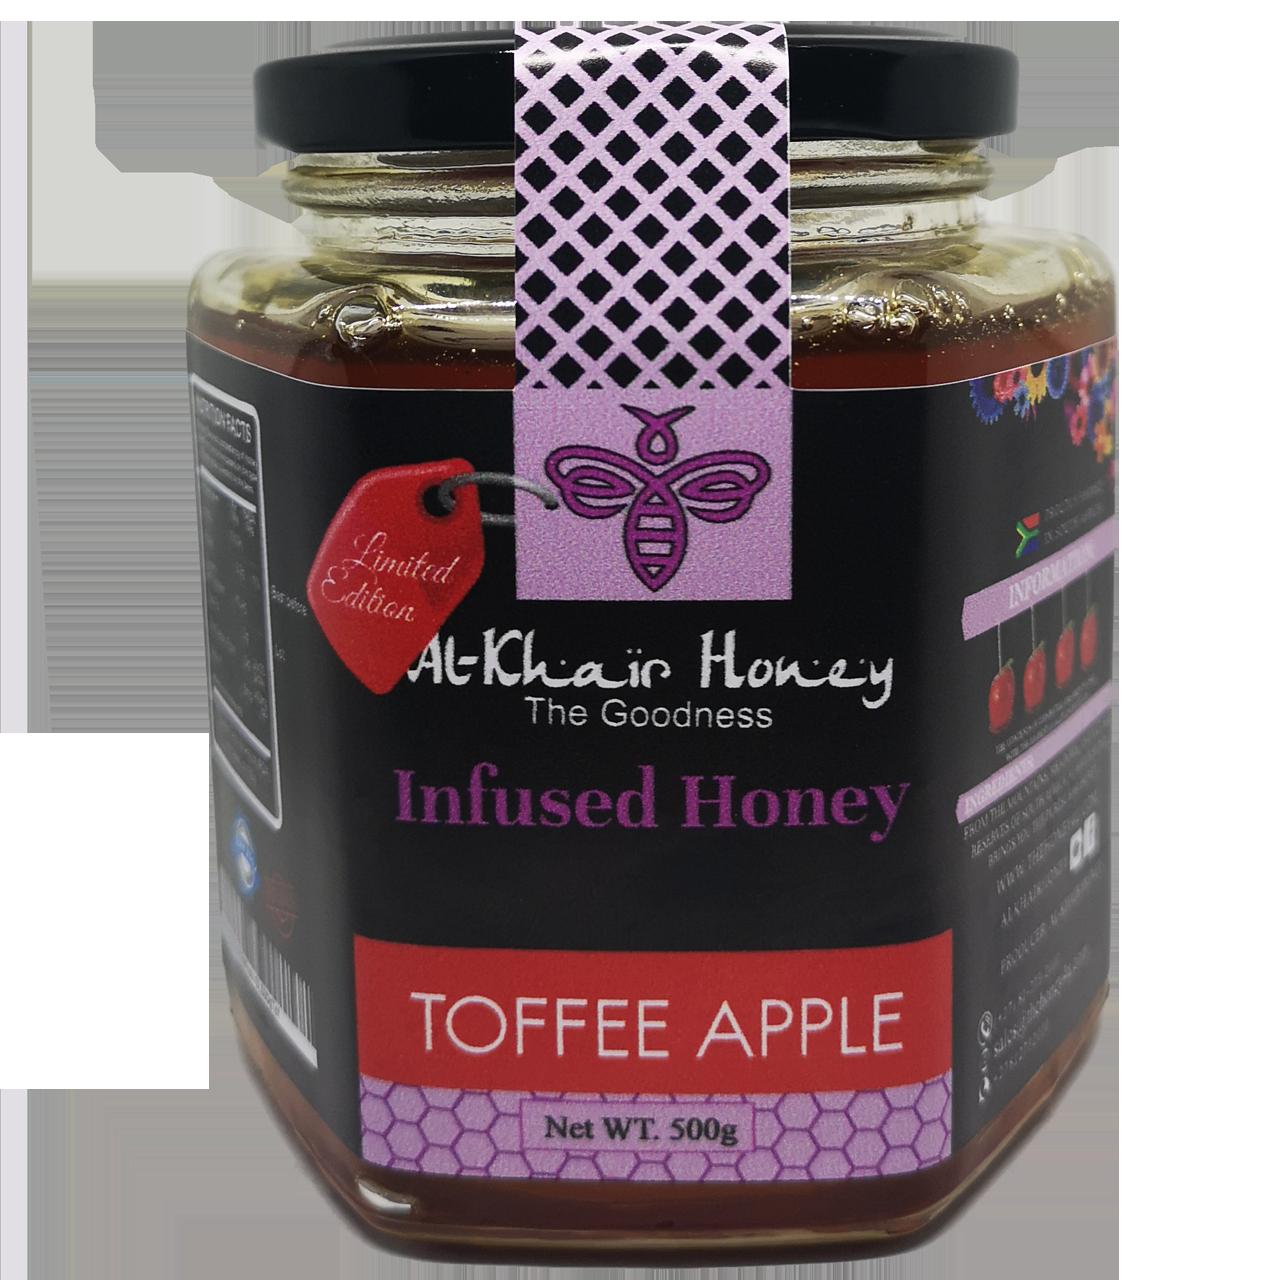 Infused Honey, Toffee Apple, 500g Glass Jar